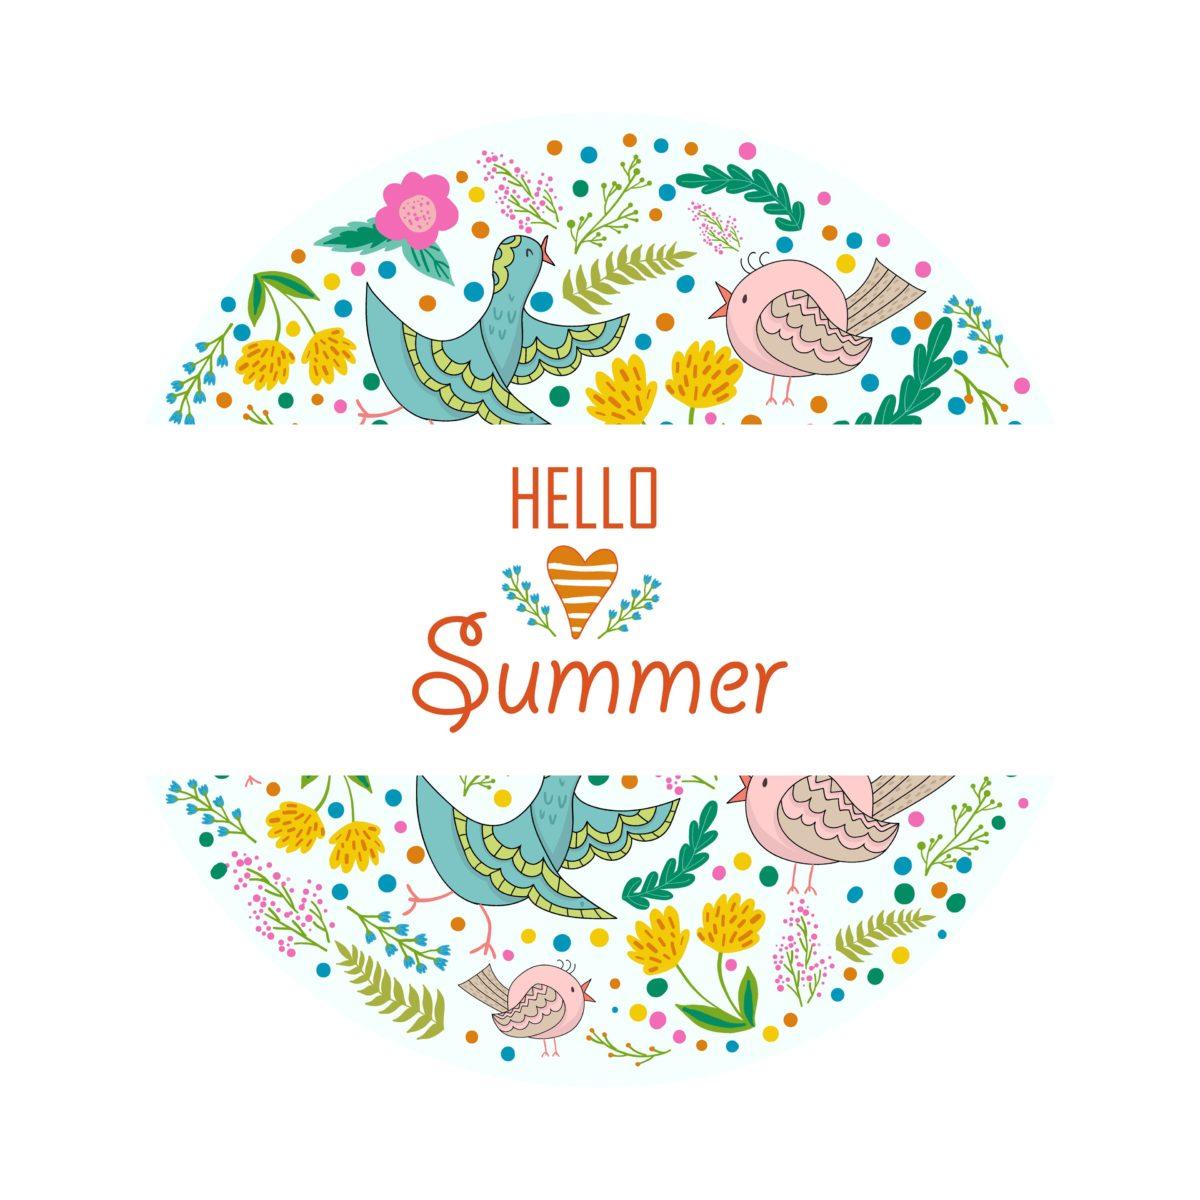 Wallpaper Hello Summer, Floral, Design, Flowers, Birds, 4K, Creative …